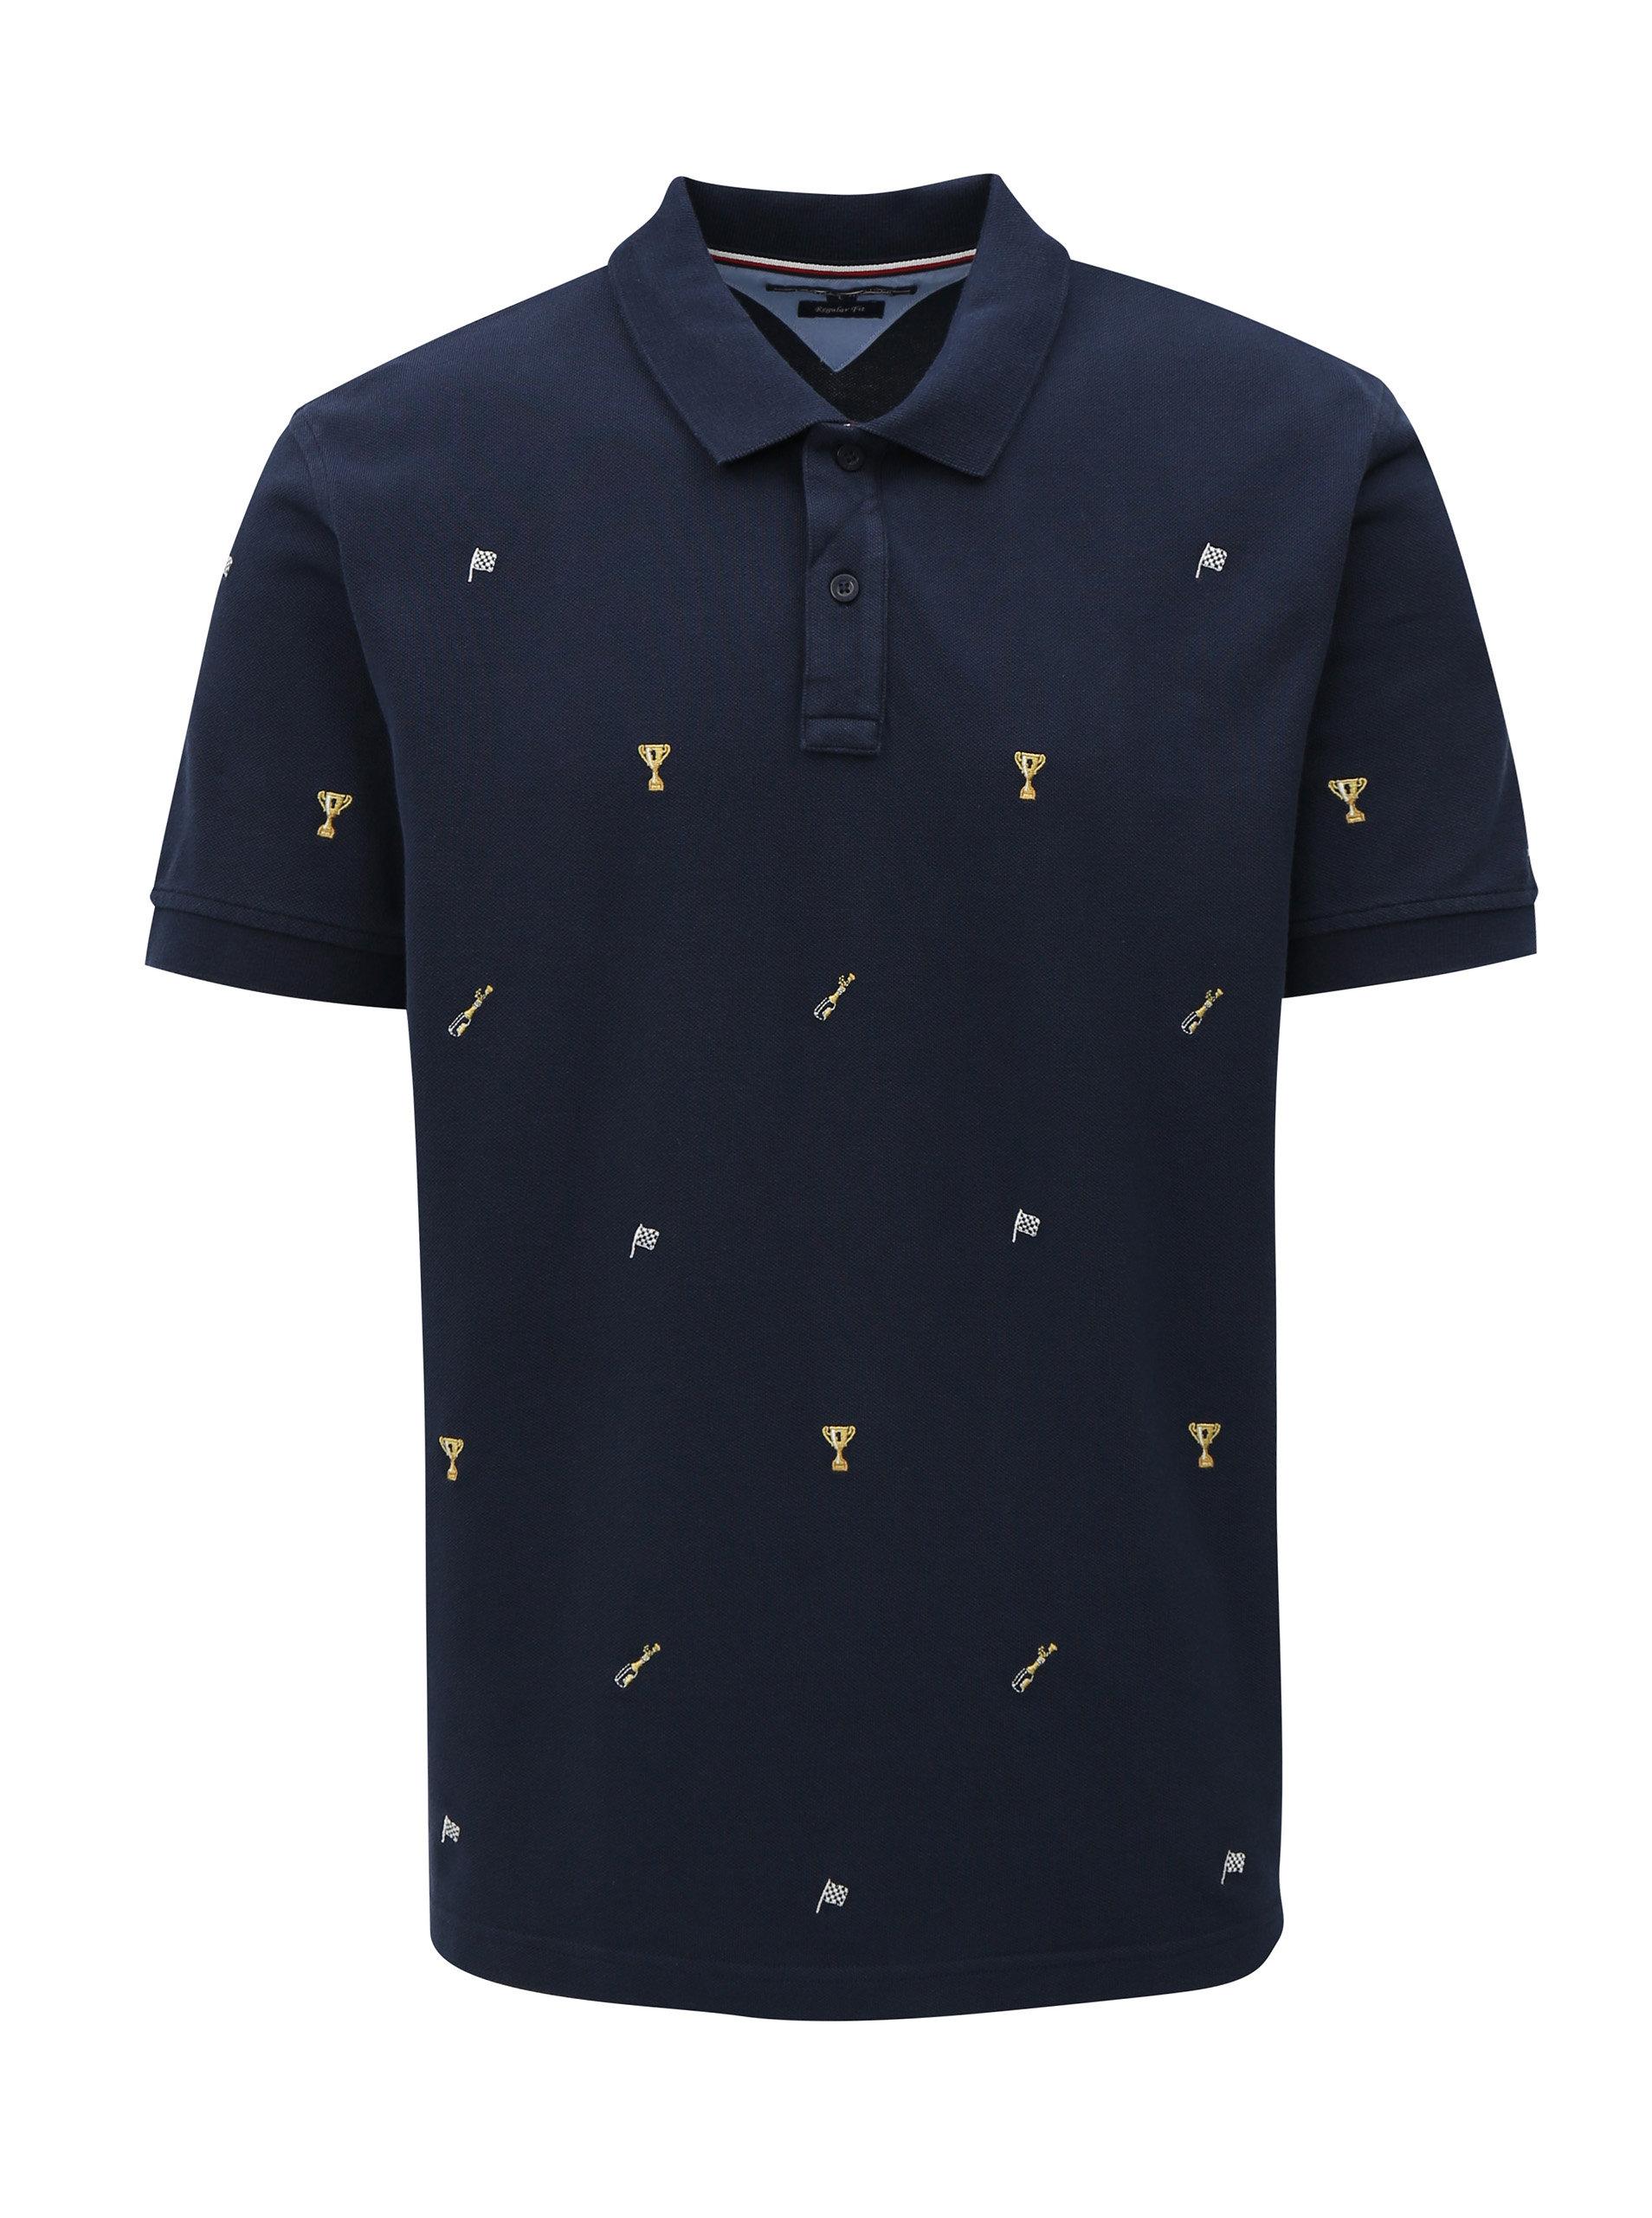 0e2e81e484 Tmavě modré pánské vzorované regular fit polo tričko Tommy Hilfiger ...